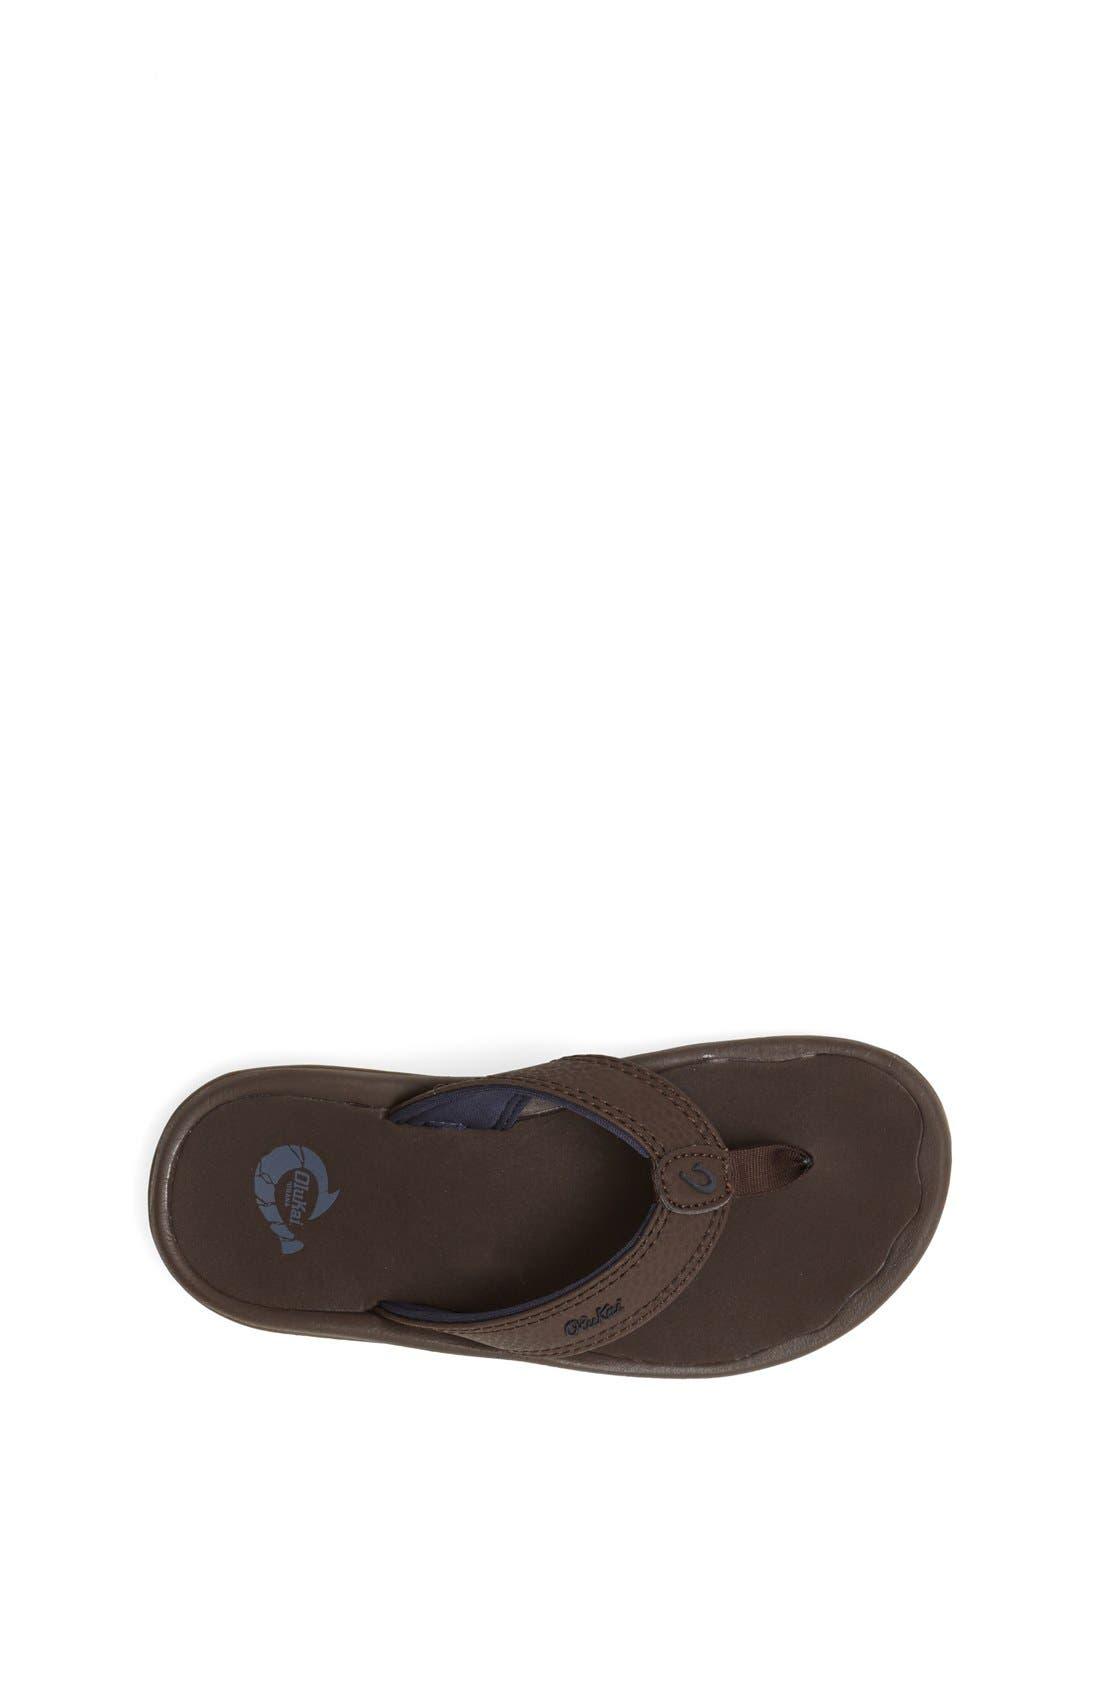 Boys Olukai Ohana Sandal Size 23 M  Brown